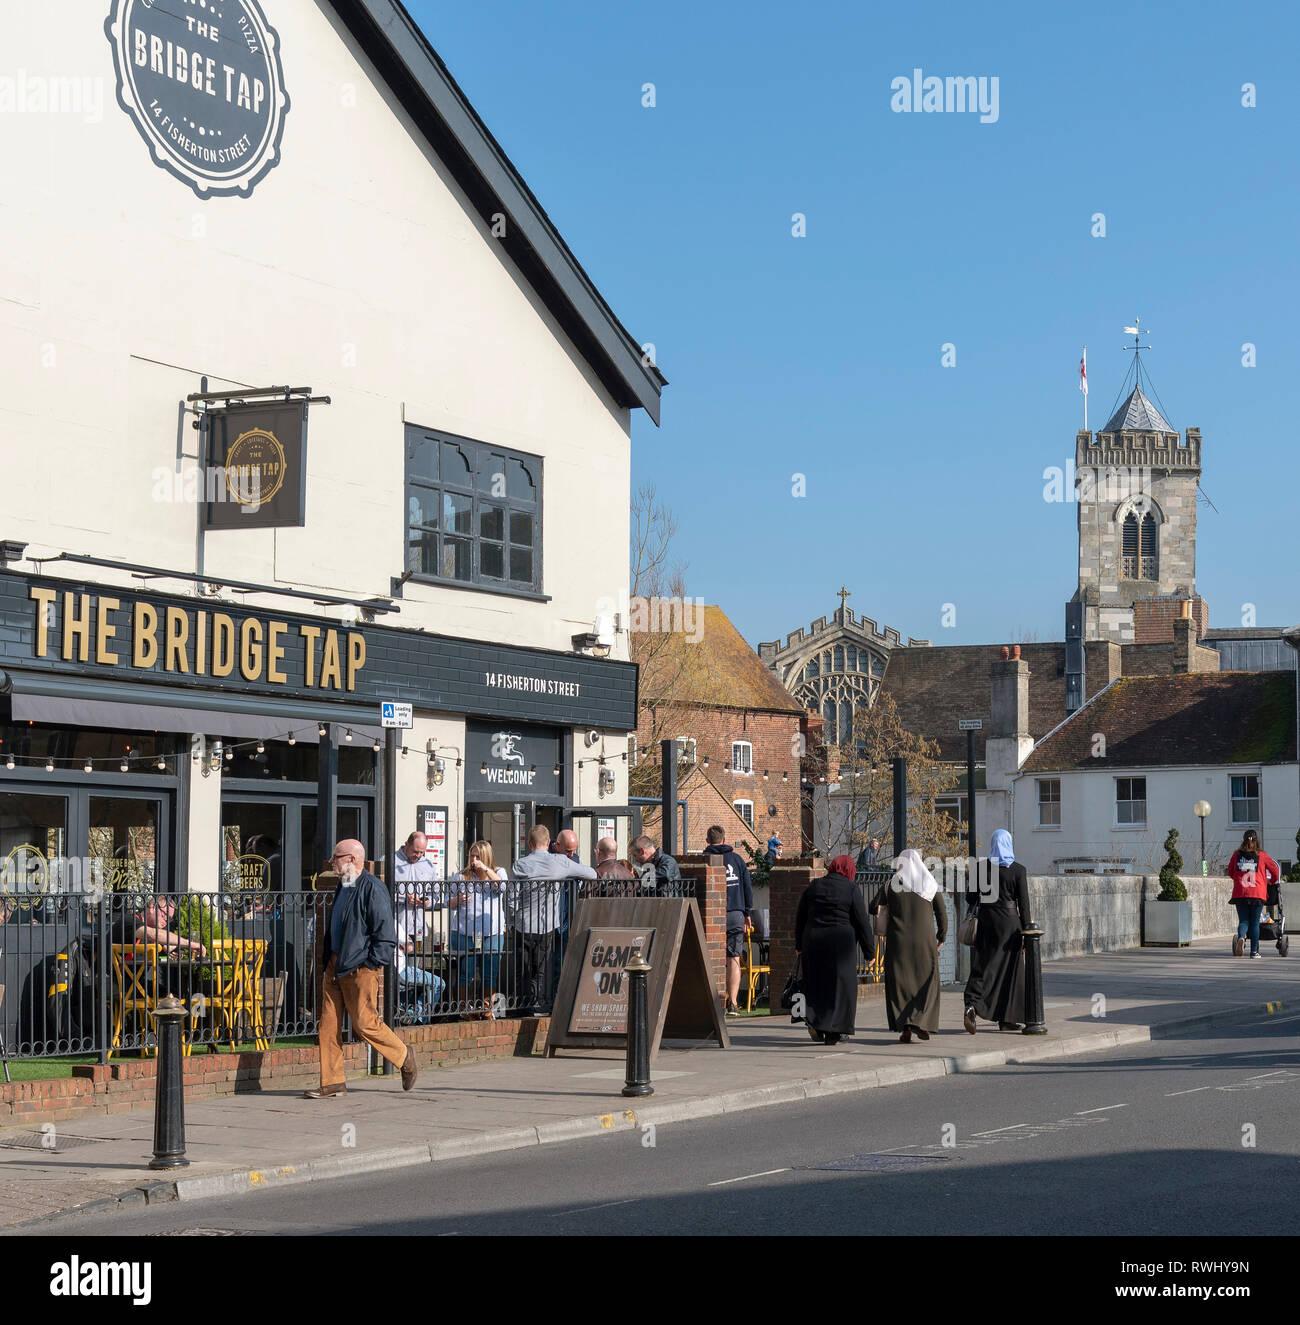 Salisbury, Wiltshire, England, UK. February 2019. The Bridge Tap pub on Fisherton Street in the city centre. Background of St Thomas's Church. - Stock Image